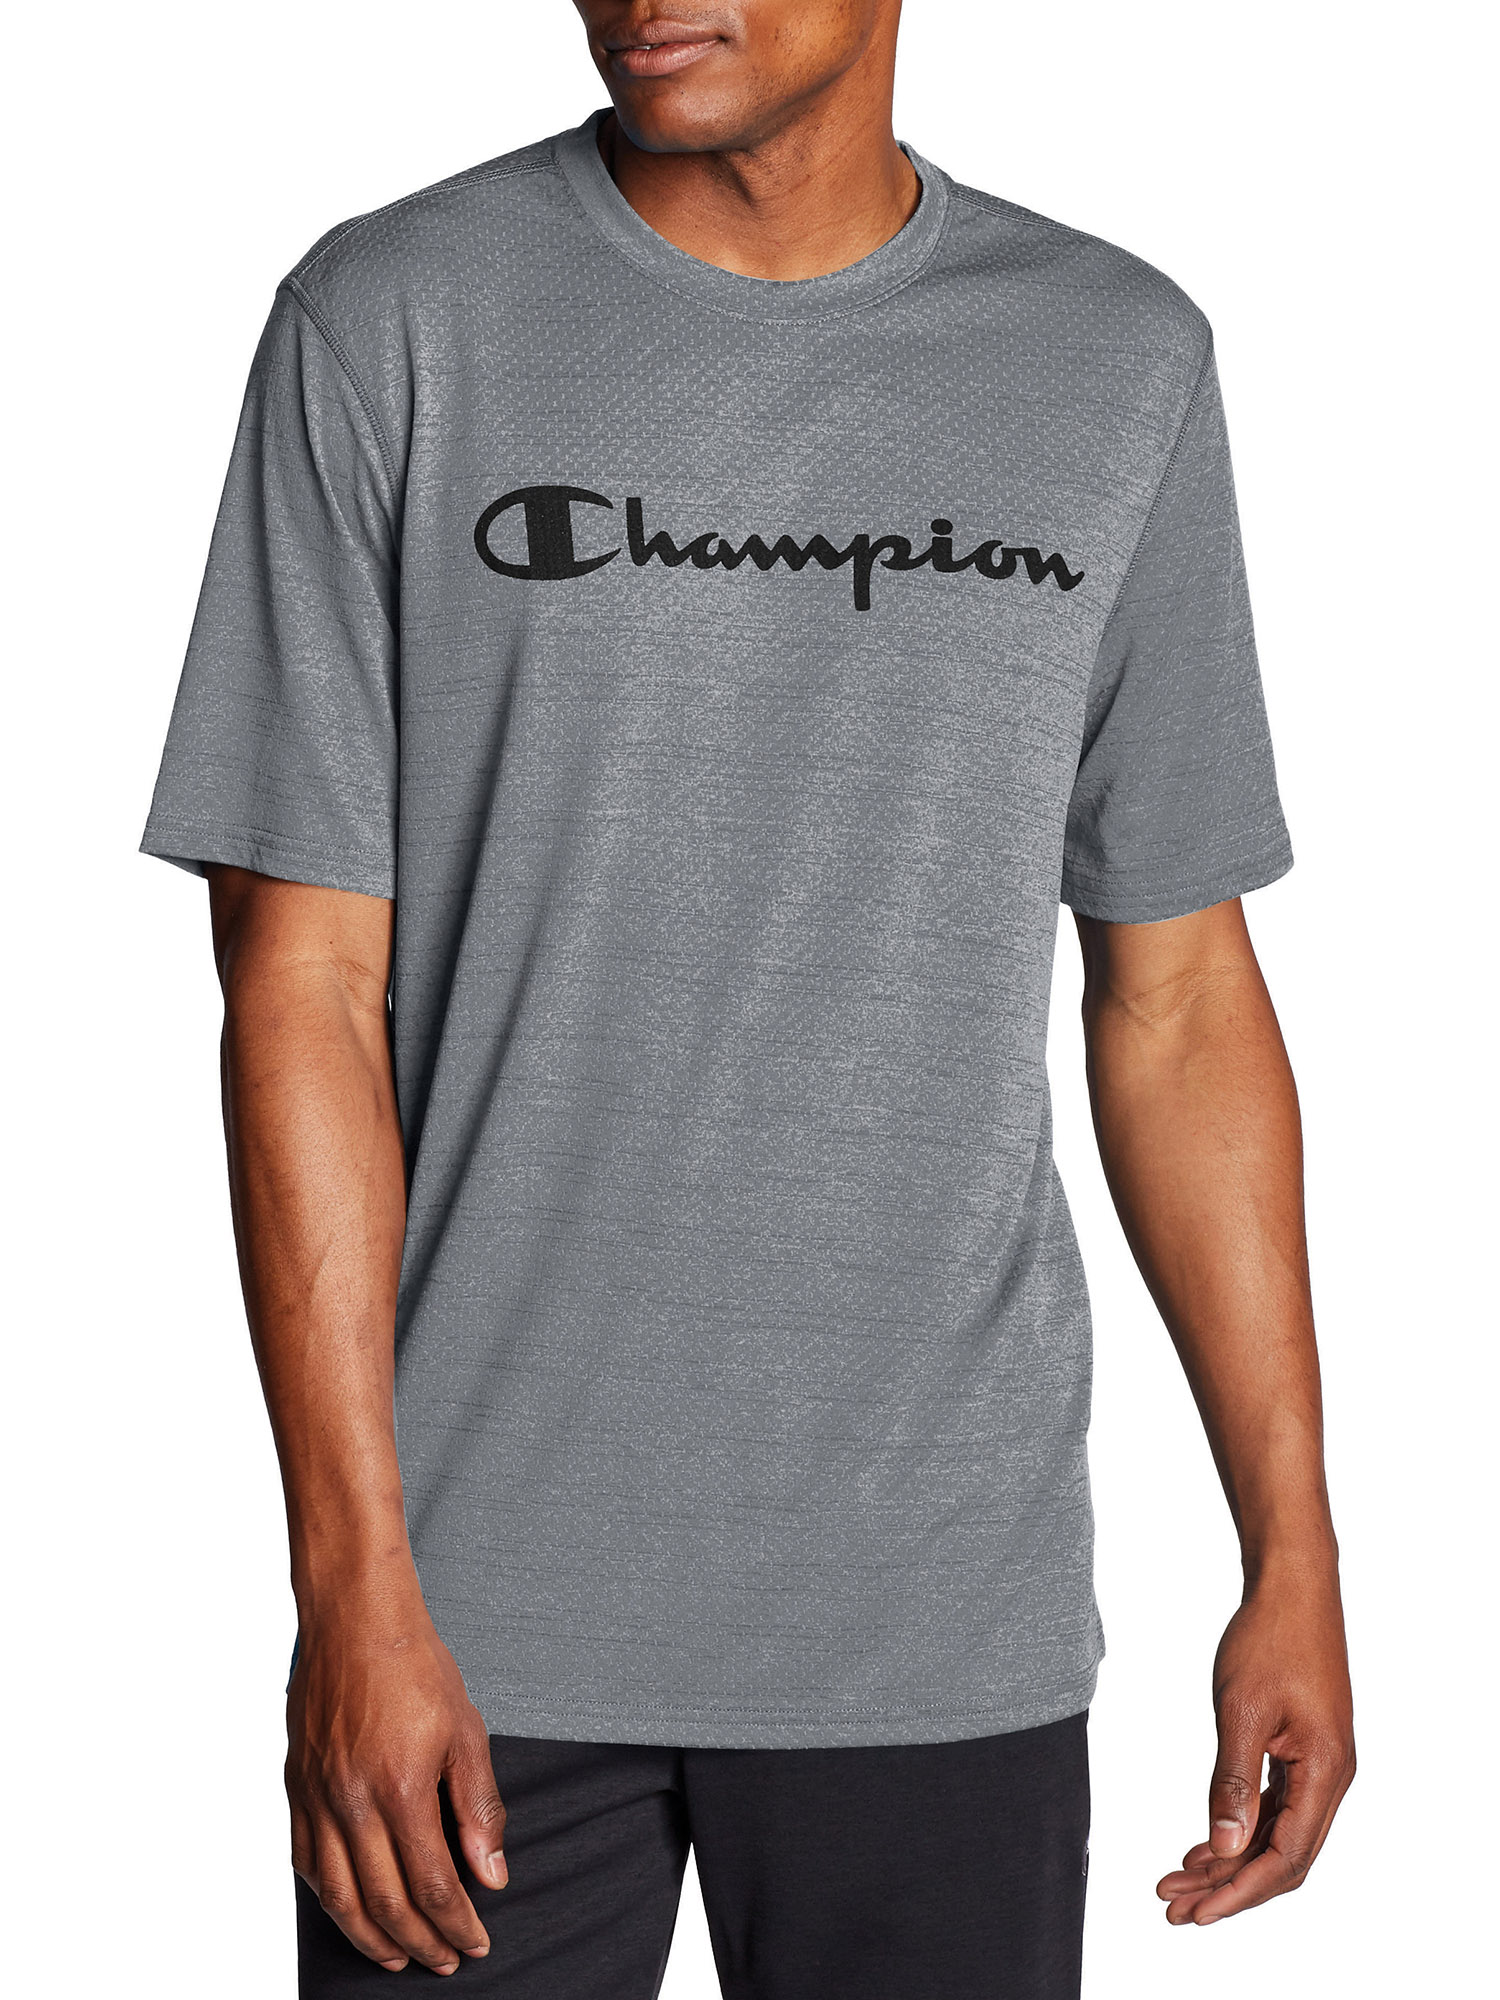 Champion Men/'s Graphic Champion Tee Gray 2XL